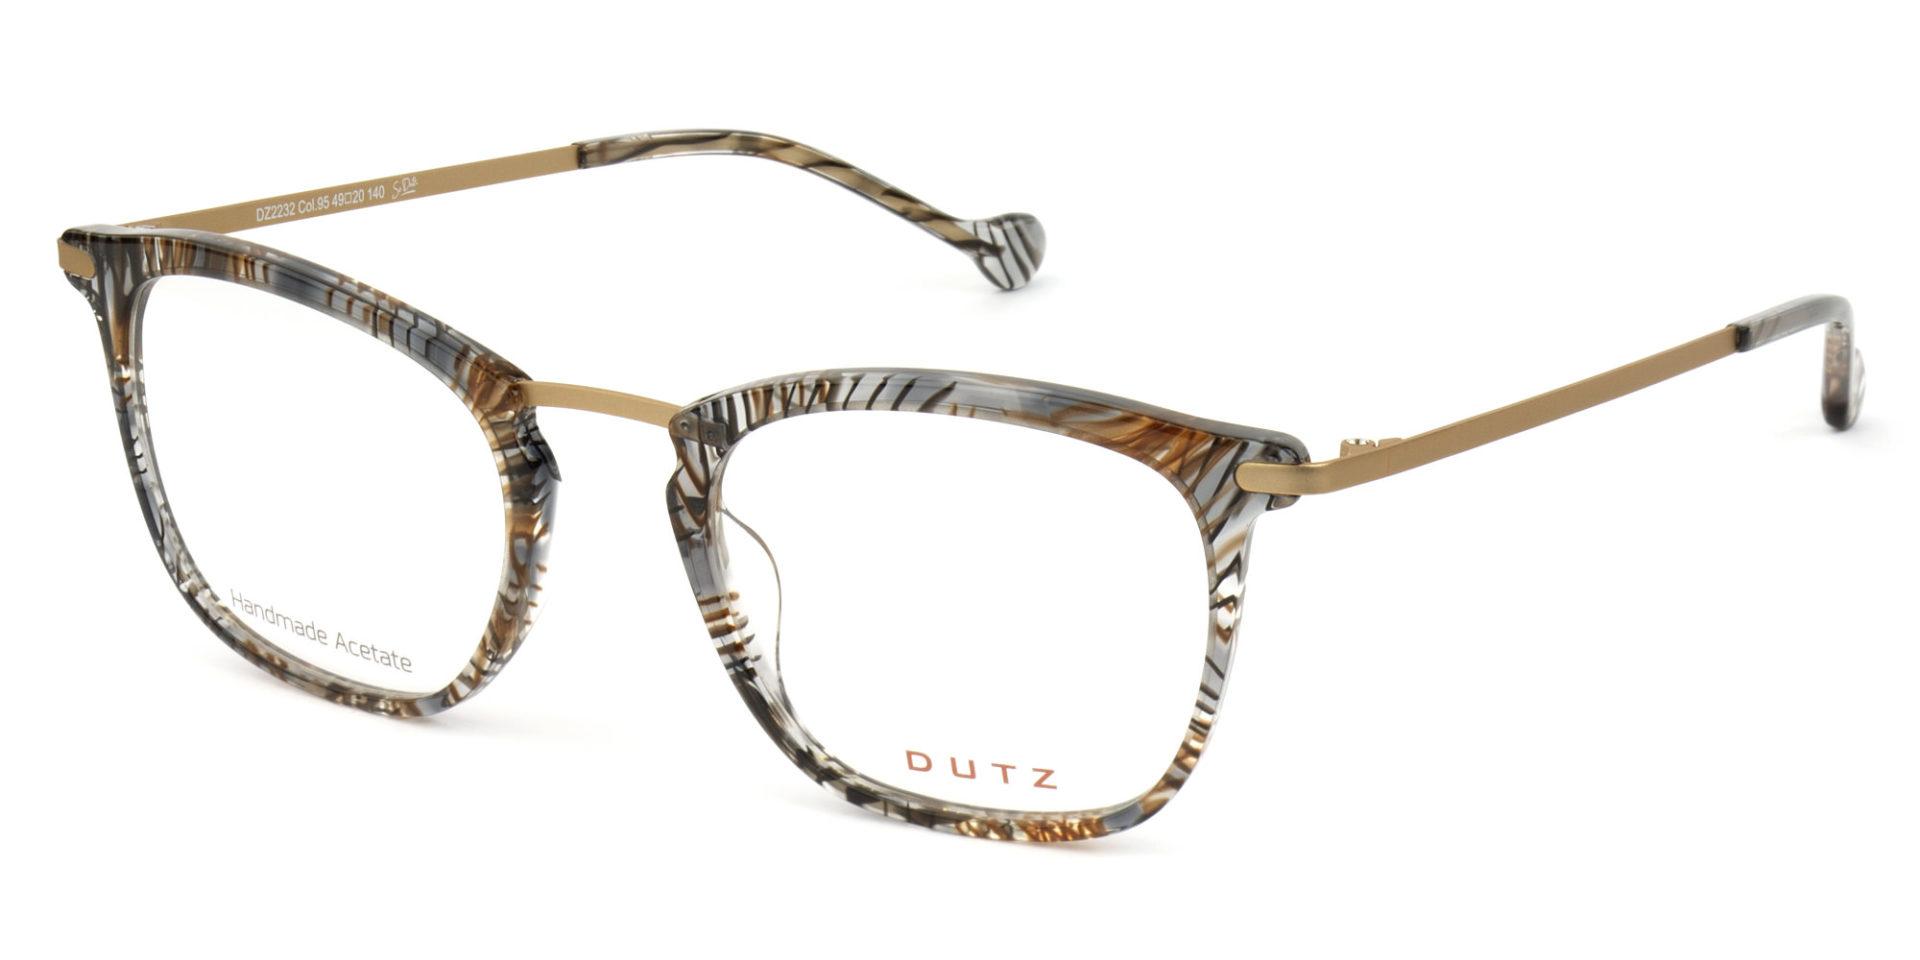 DZ2232-95